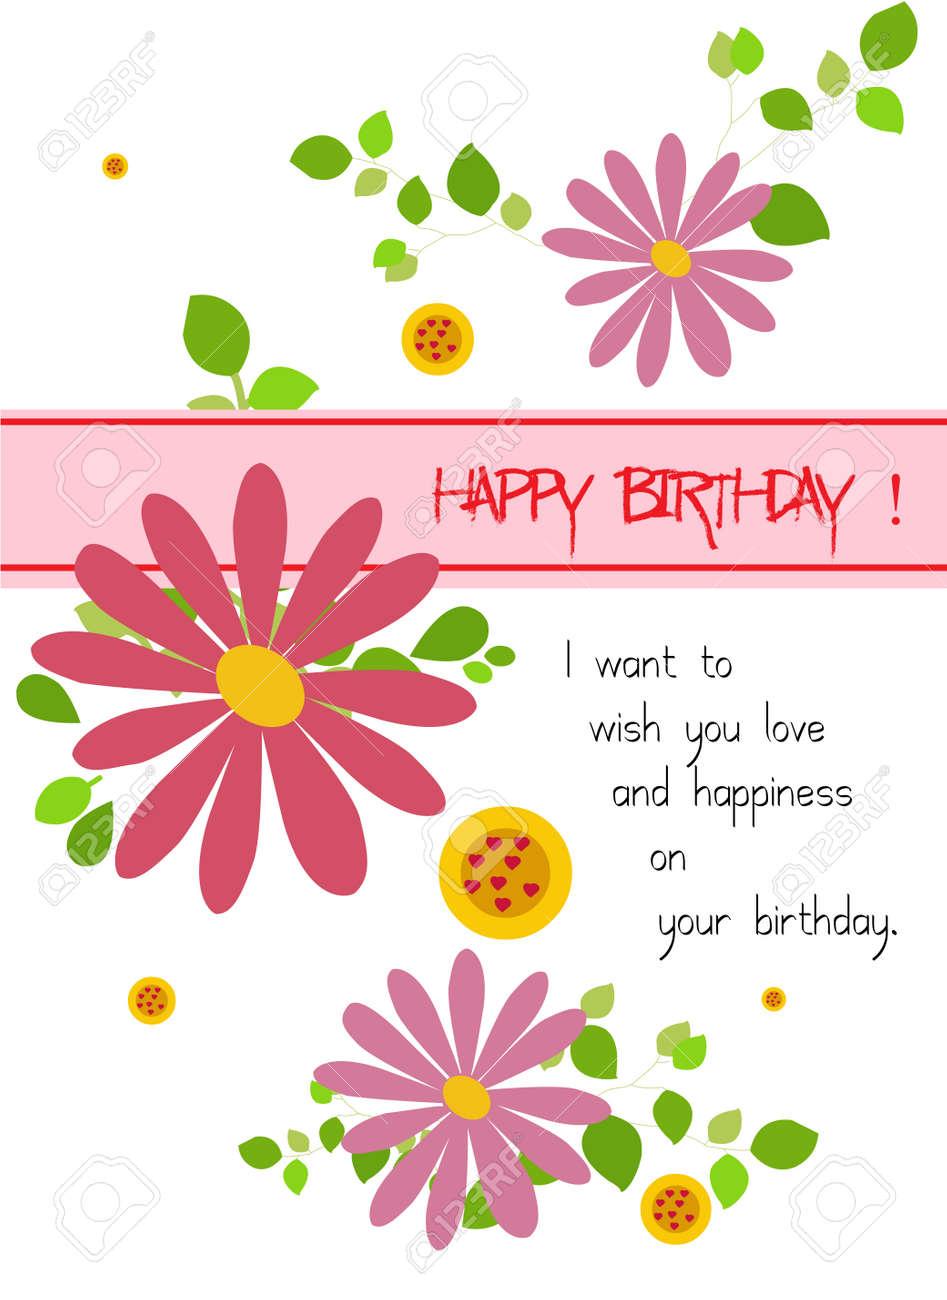 Happy birthday with flowers royalty free cliparts vectors and happy birthday with flowers stock vector 24123843 izmirmasajfo Choice Image